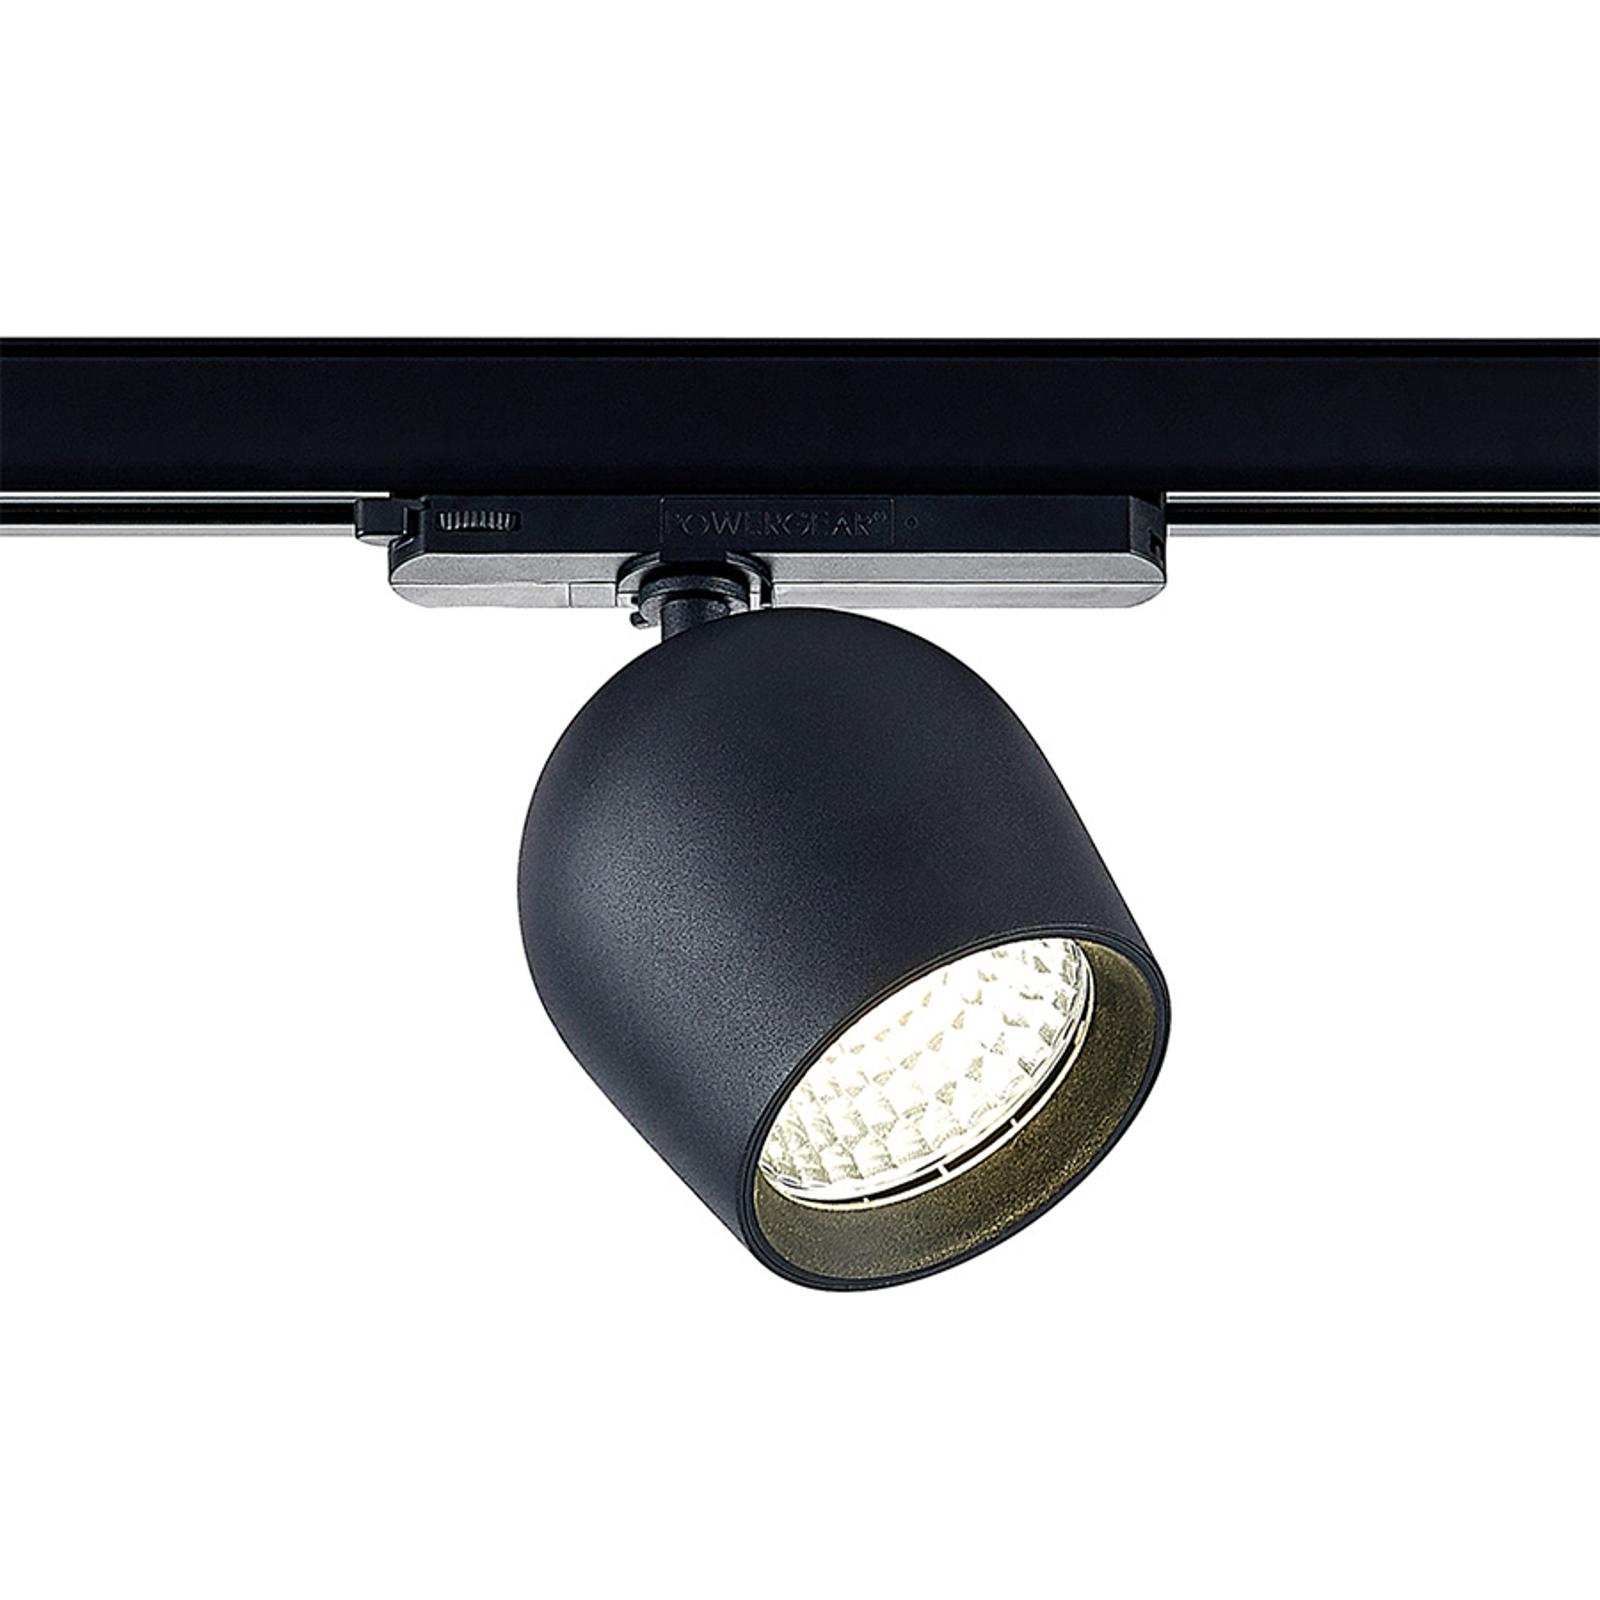 Arcchio Bauke LED-kiskospotti musta 30,5W 4 000 K